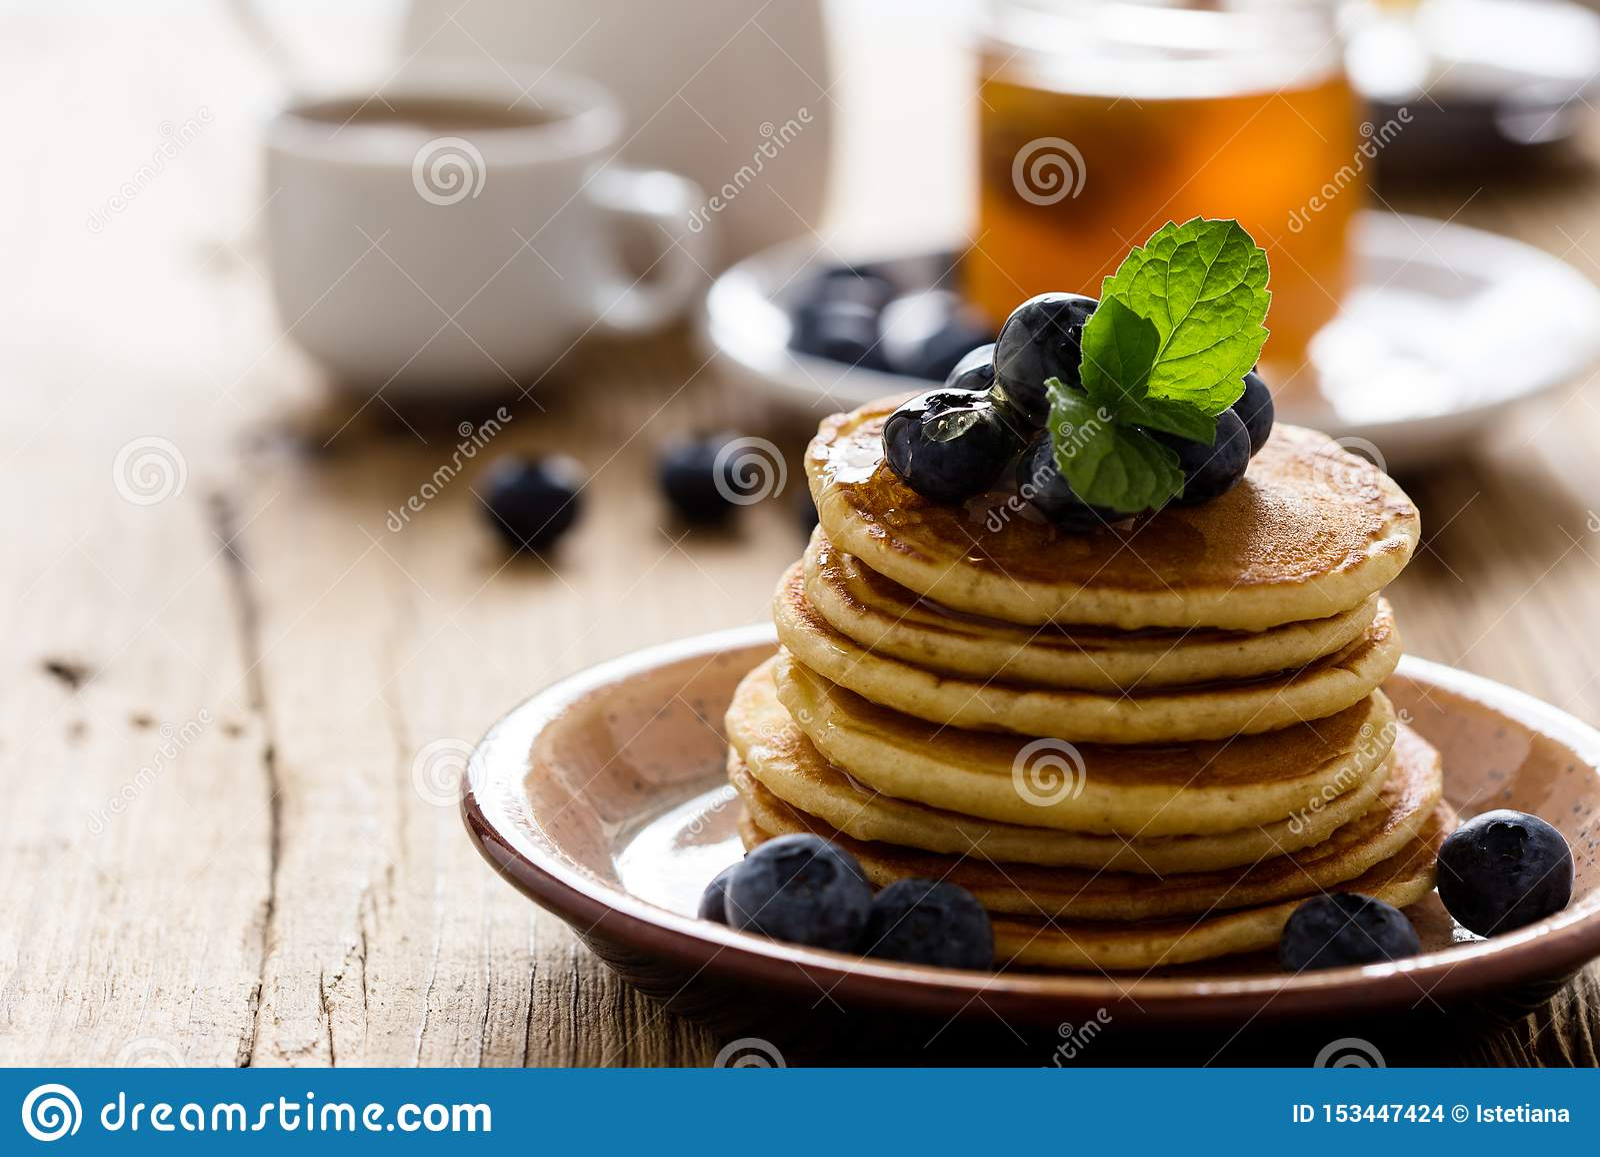 Morning meal, homemade pancakes, fresh summer berries